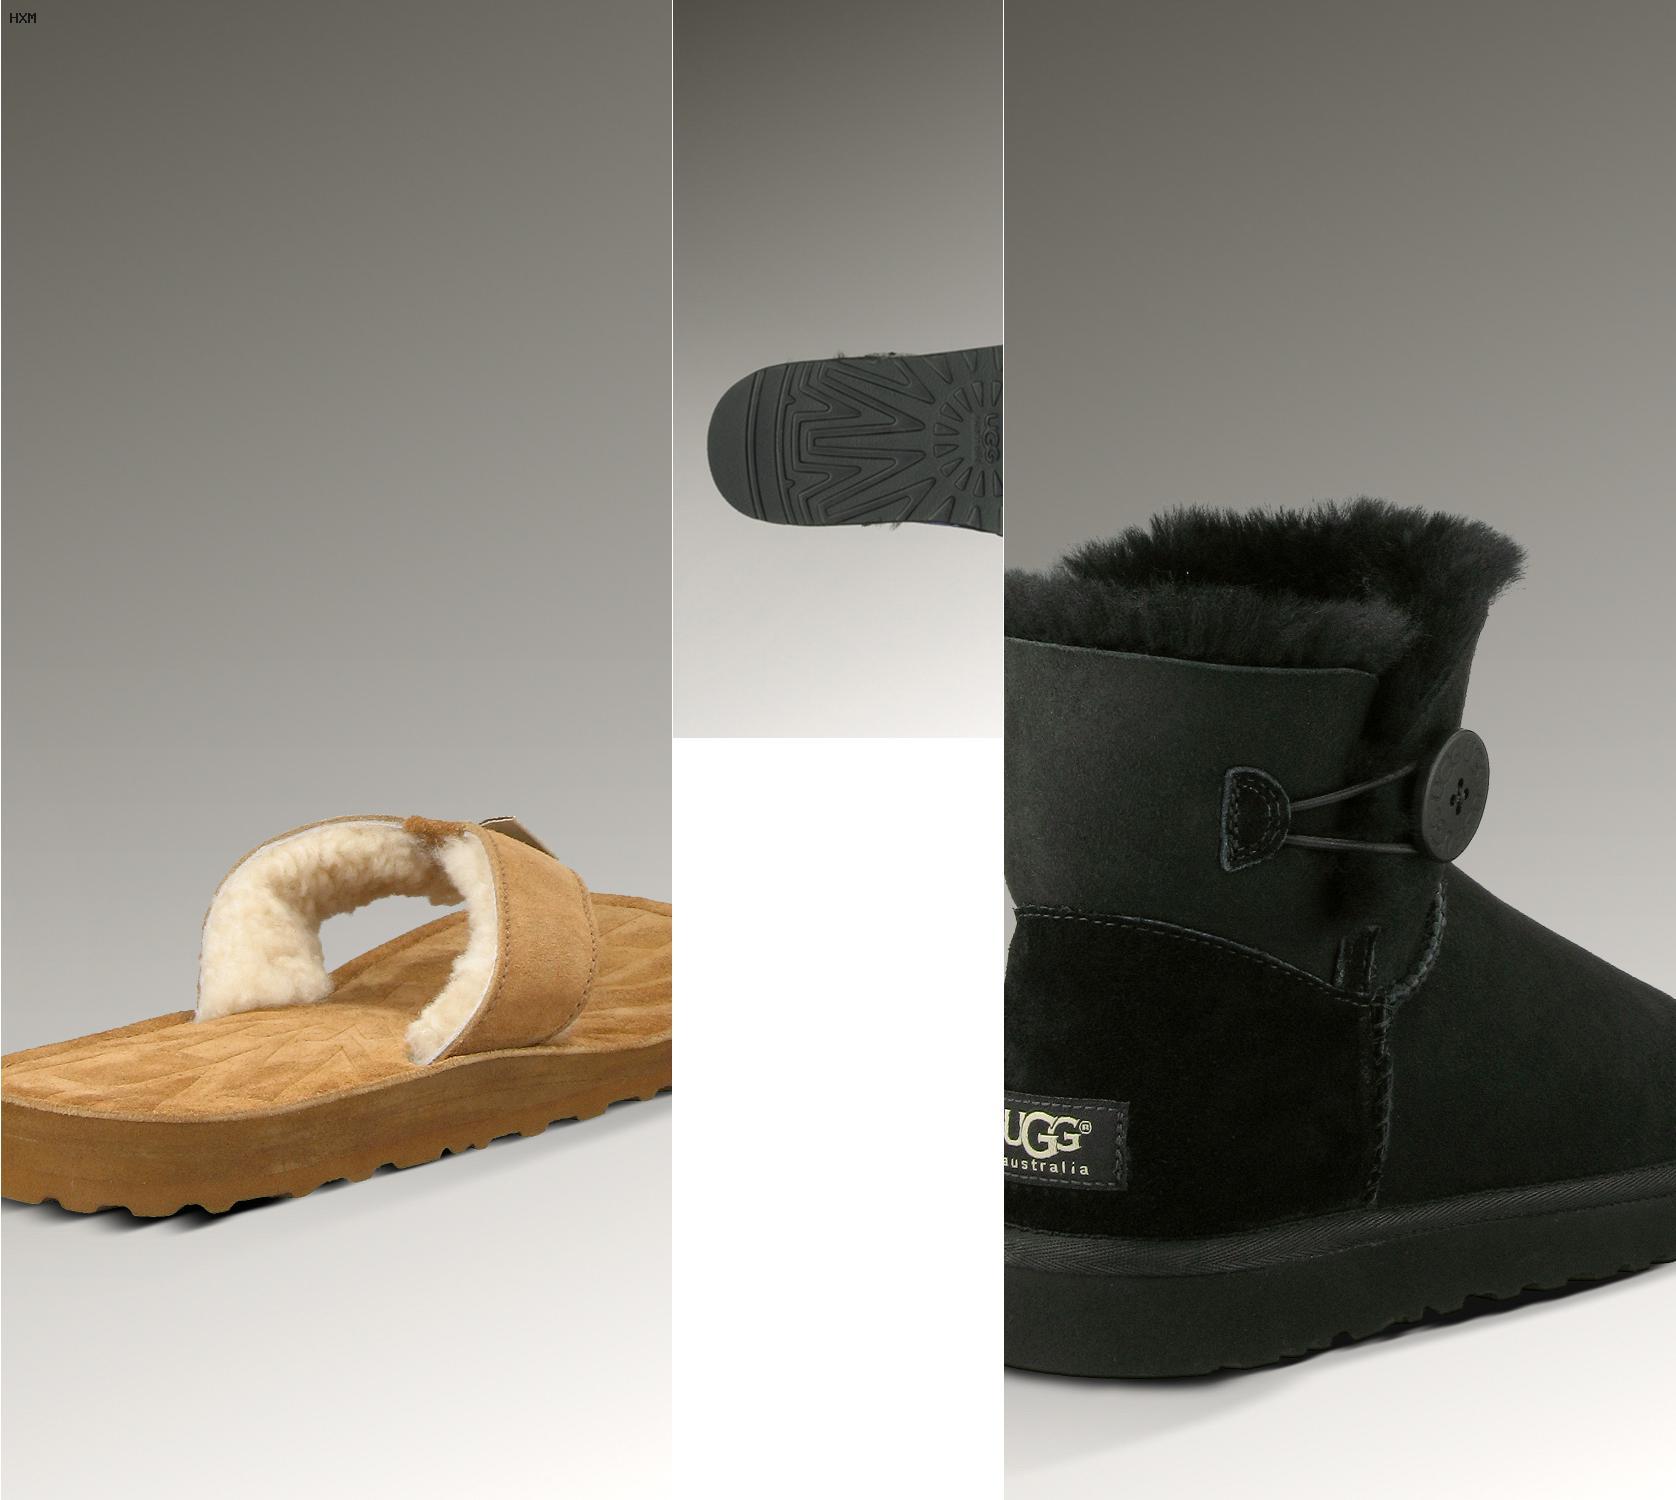 a4b06688bace black friday angebote ugg boots